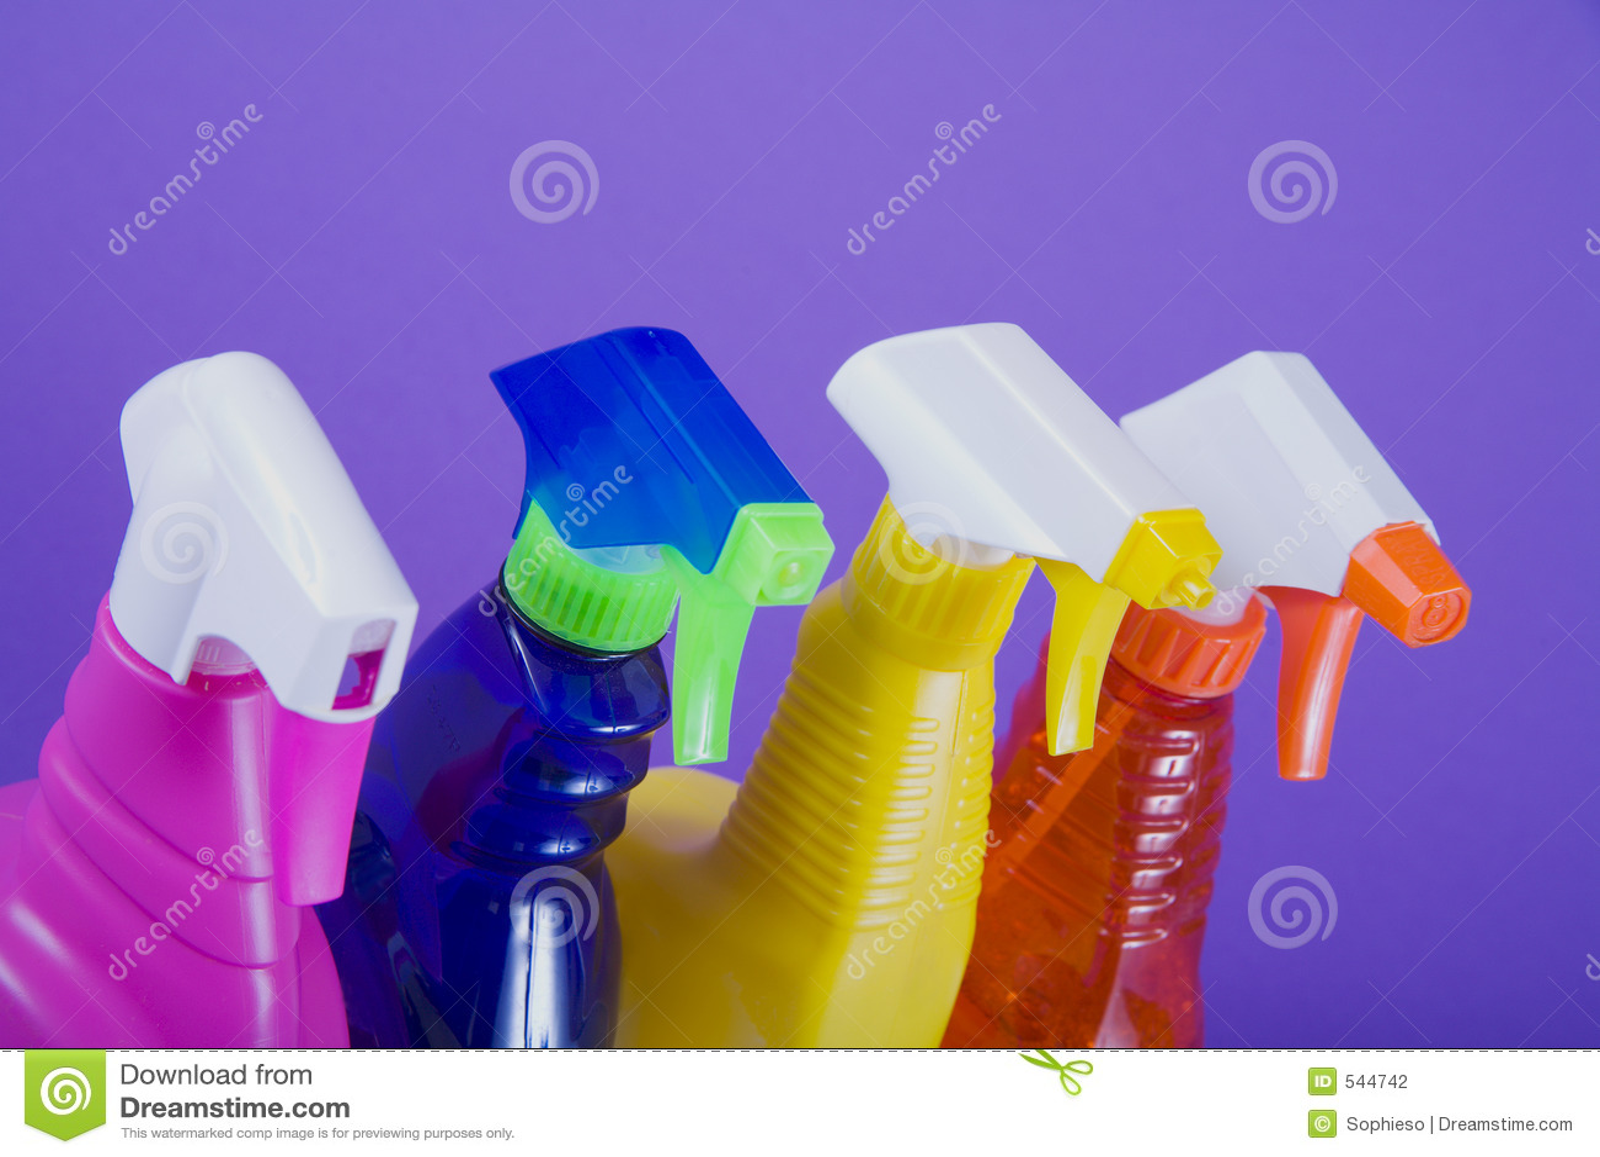 Download 春天战士 库存照片. 图片 包括有 新鲜, 橙色, 蓝色, 准备好, 出现, 化学制品, 分配器, 擦净剂, 倒挂金钟 - 544742